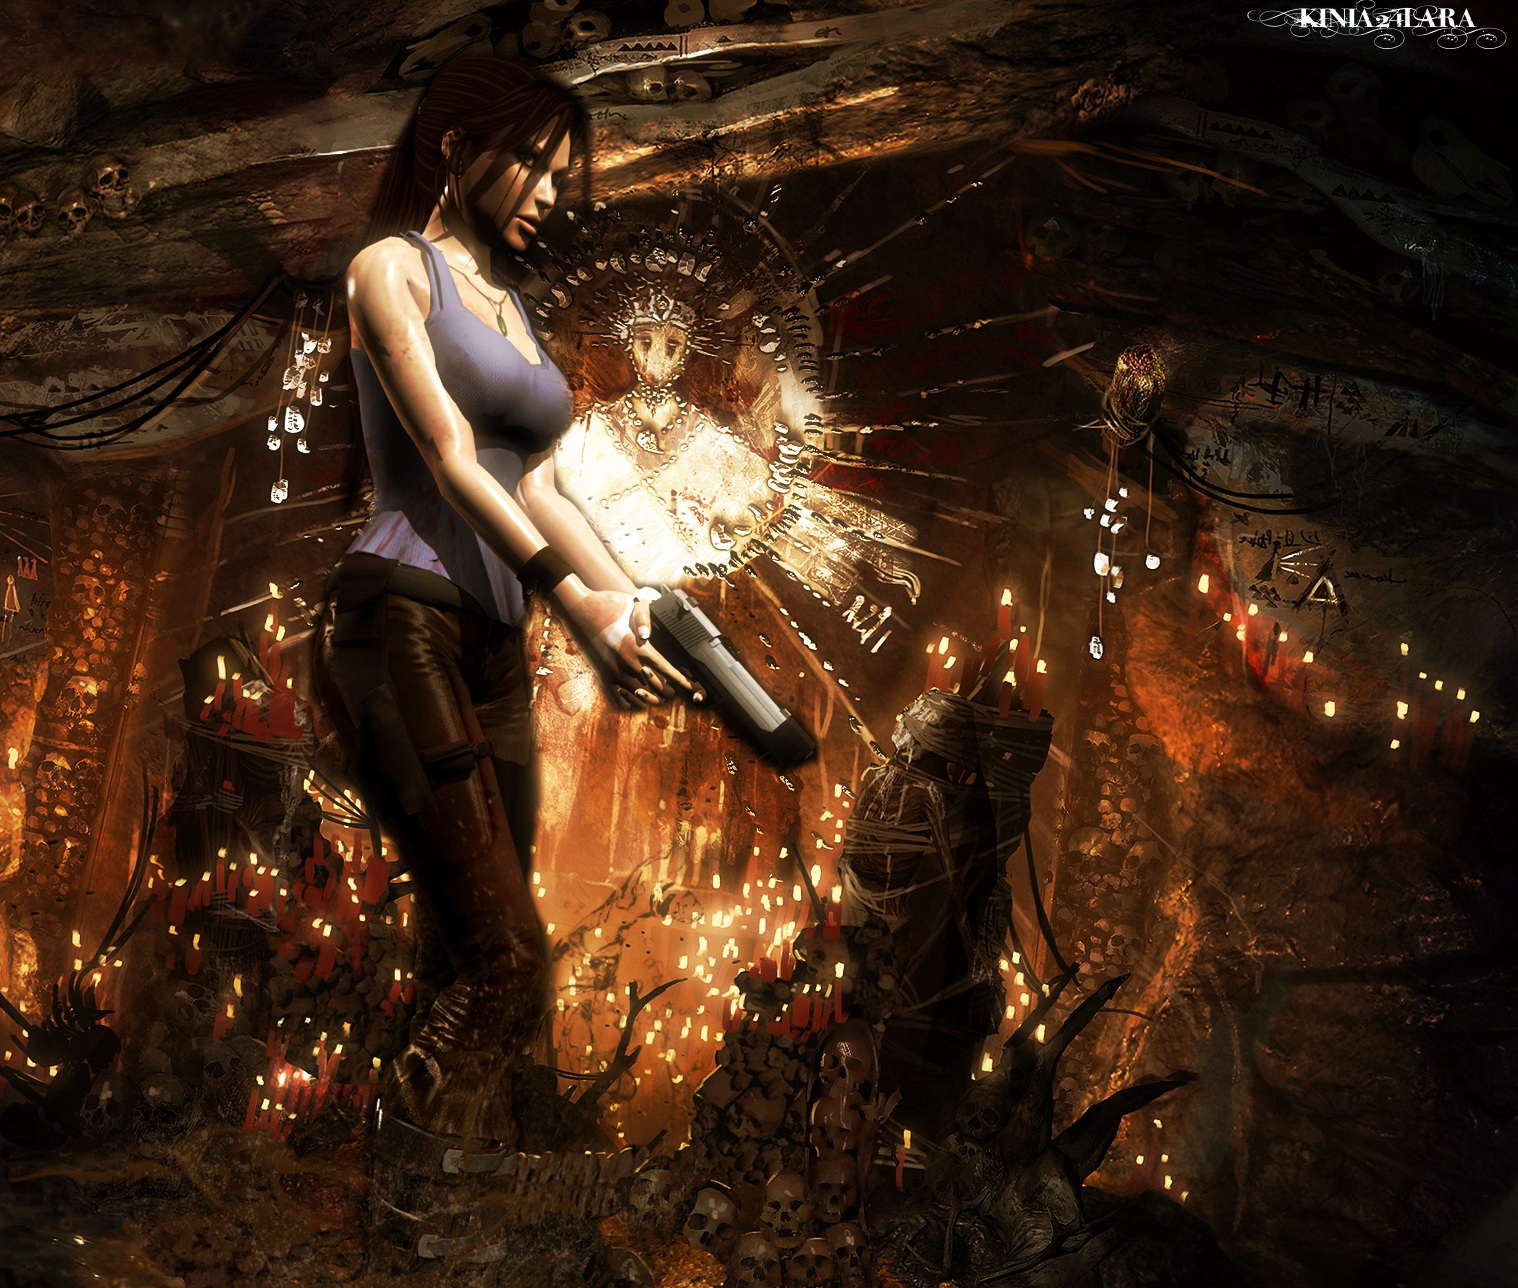 Tomb Raider 9 Render... By Kinia24Lara On DeviantArt